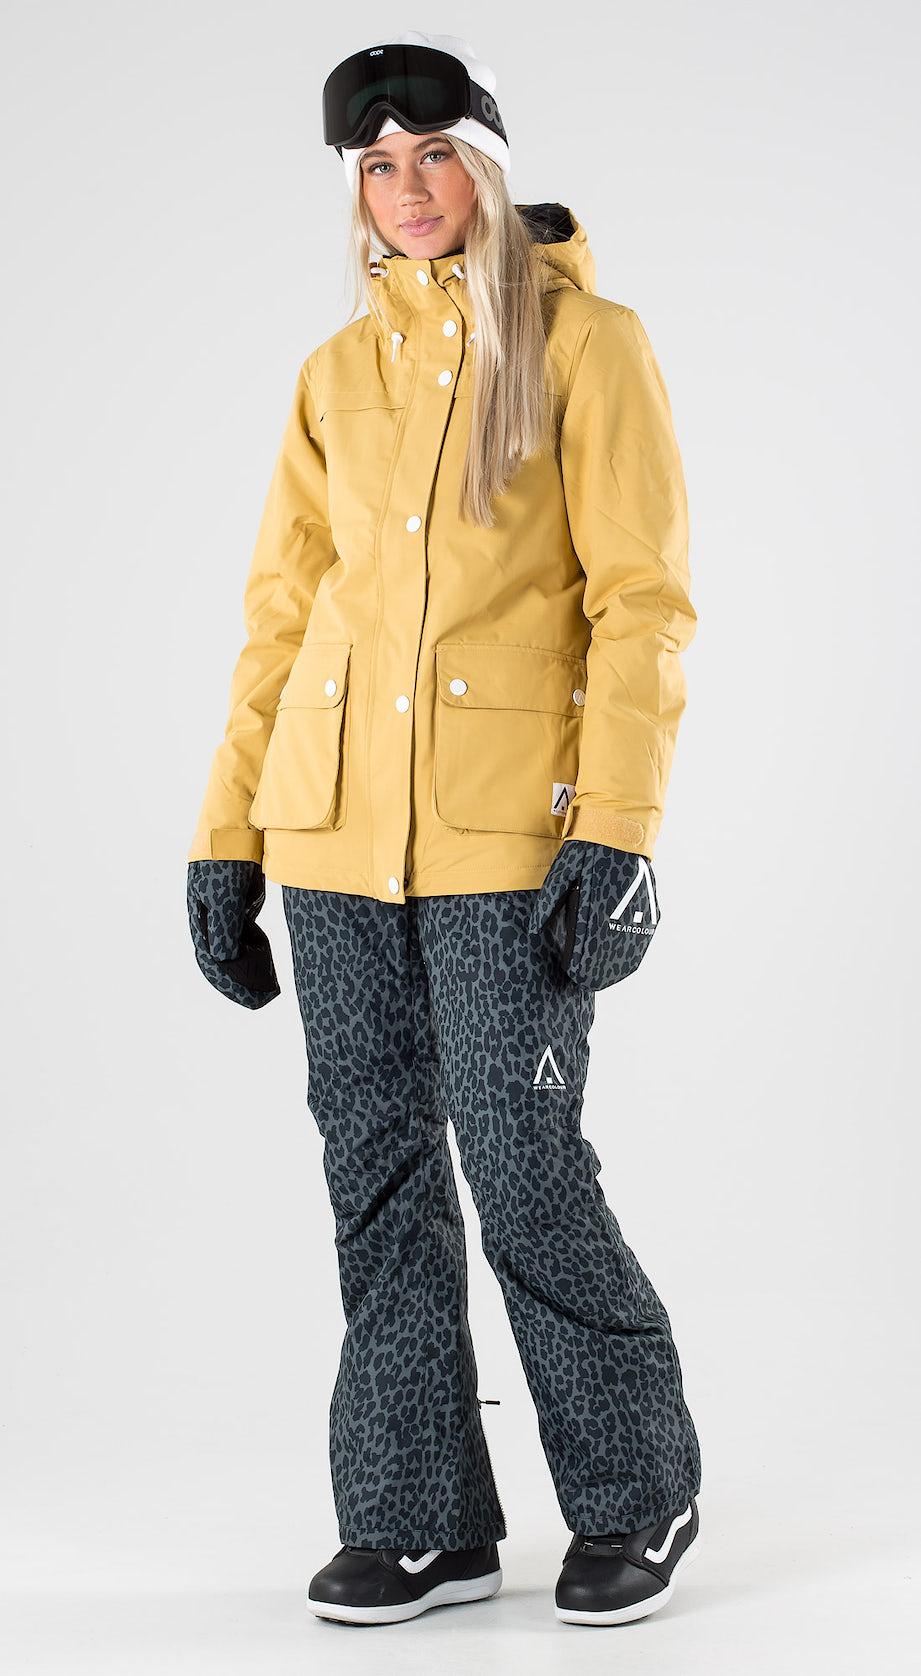 WearColour Ida Sand Snowboardkleidung Multi